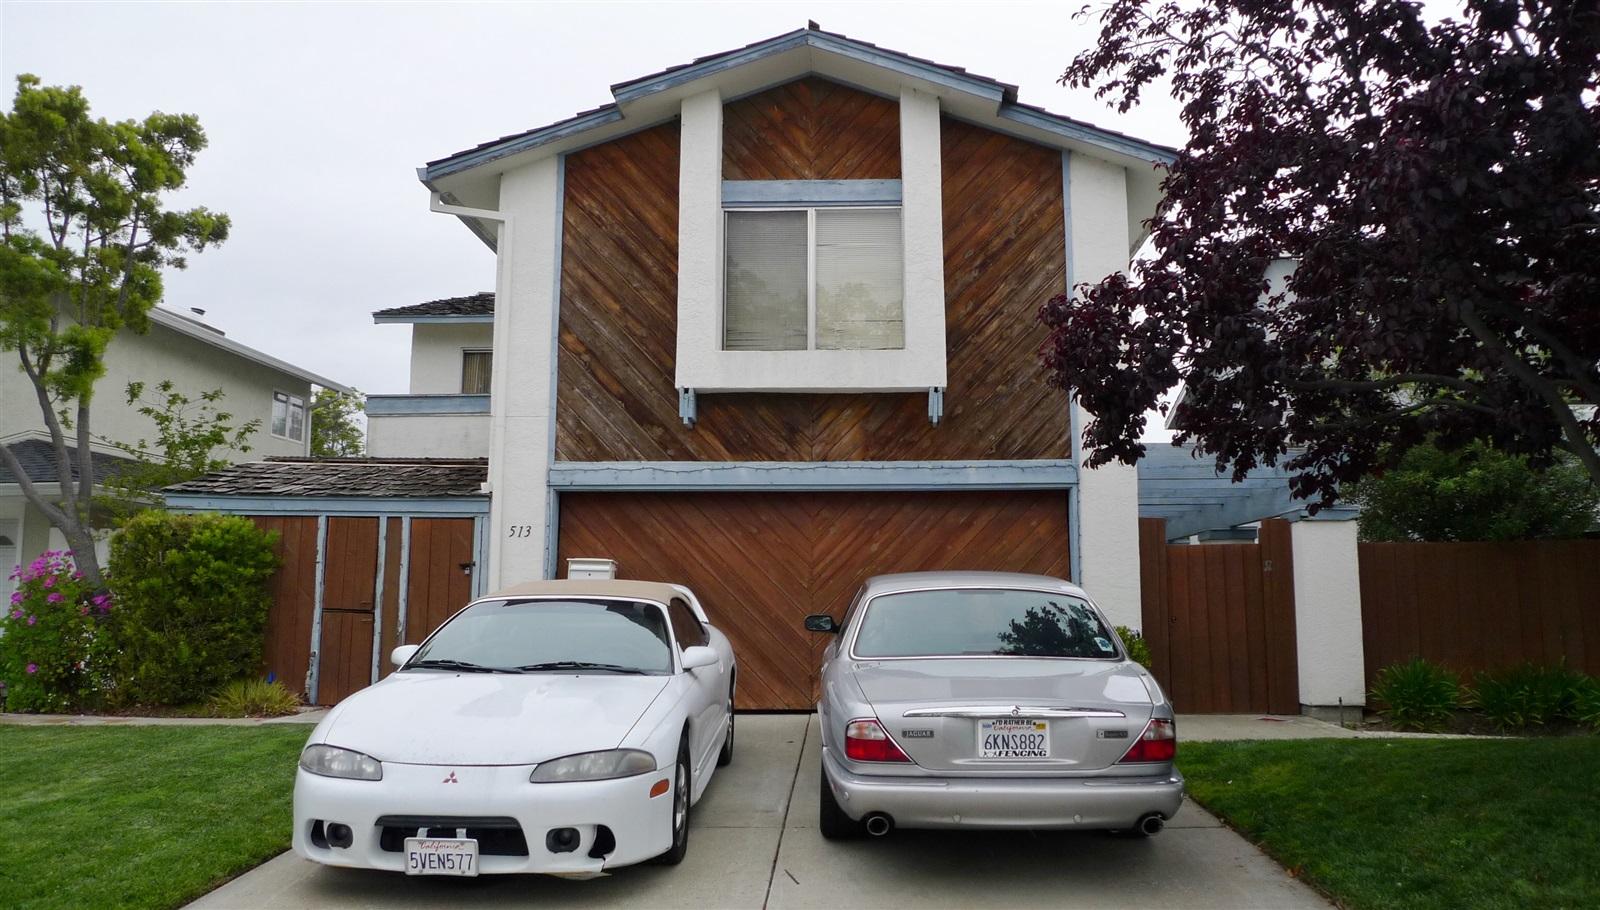 513 Pitcairn Dr, San Mateo, CA 94404